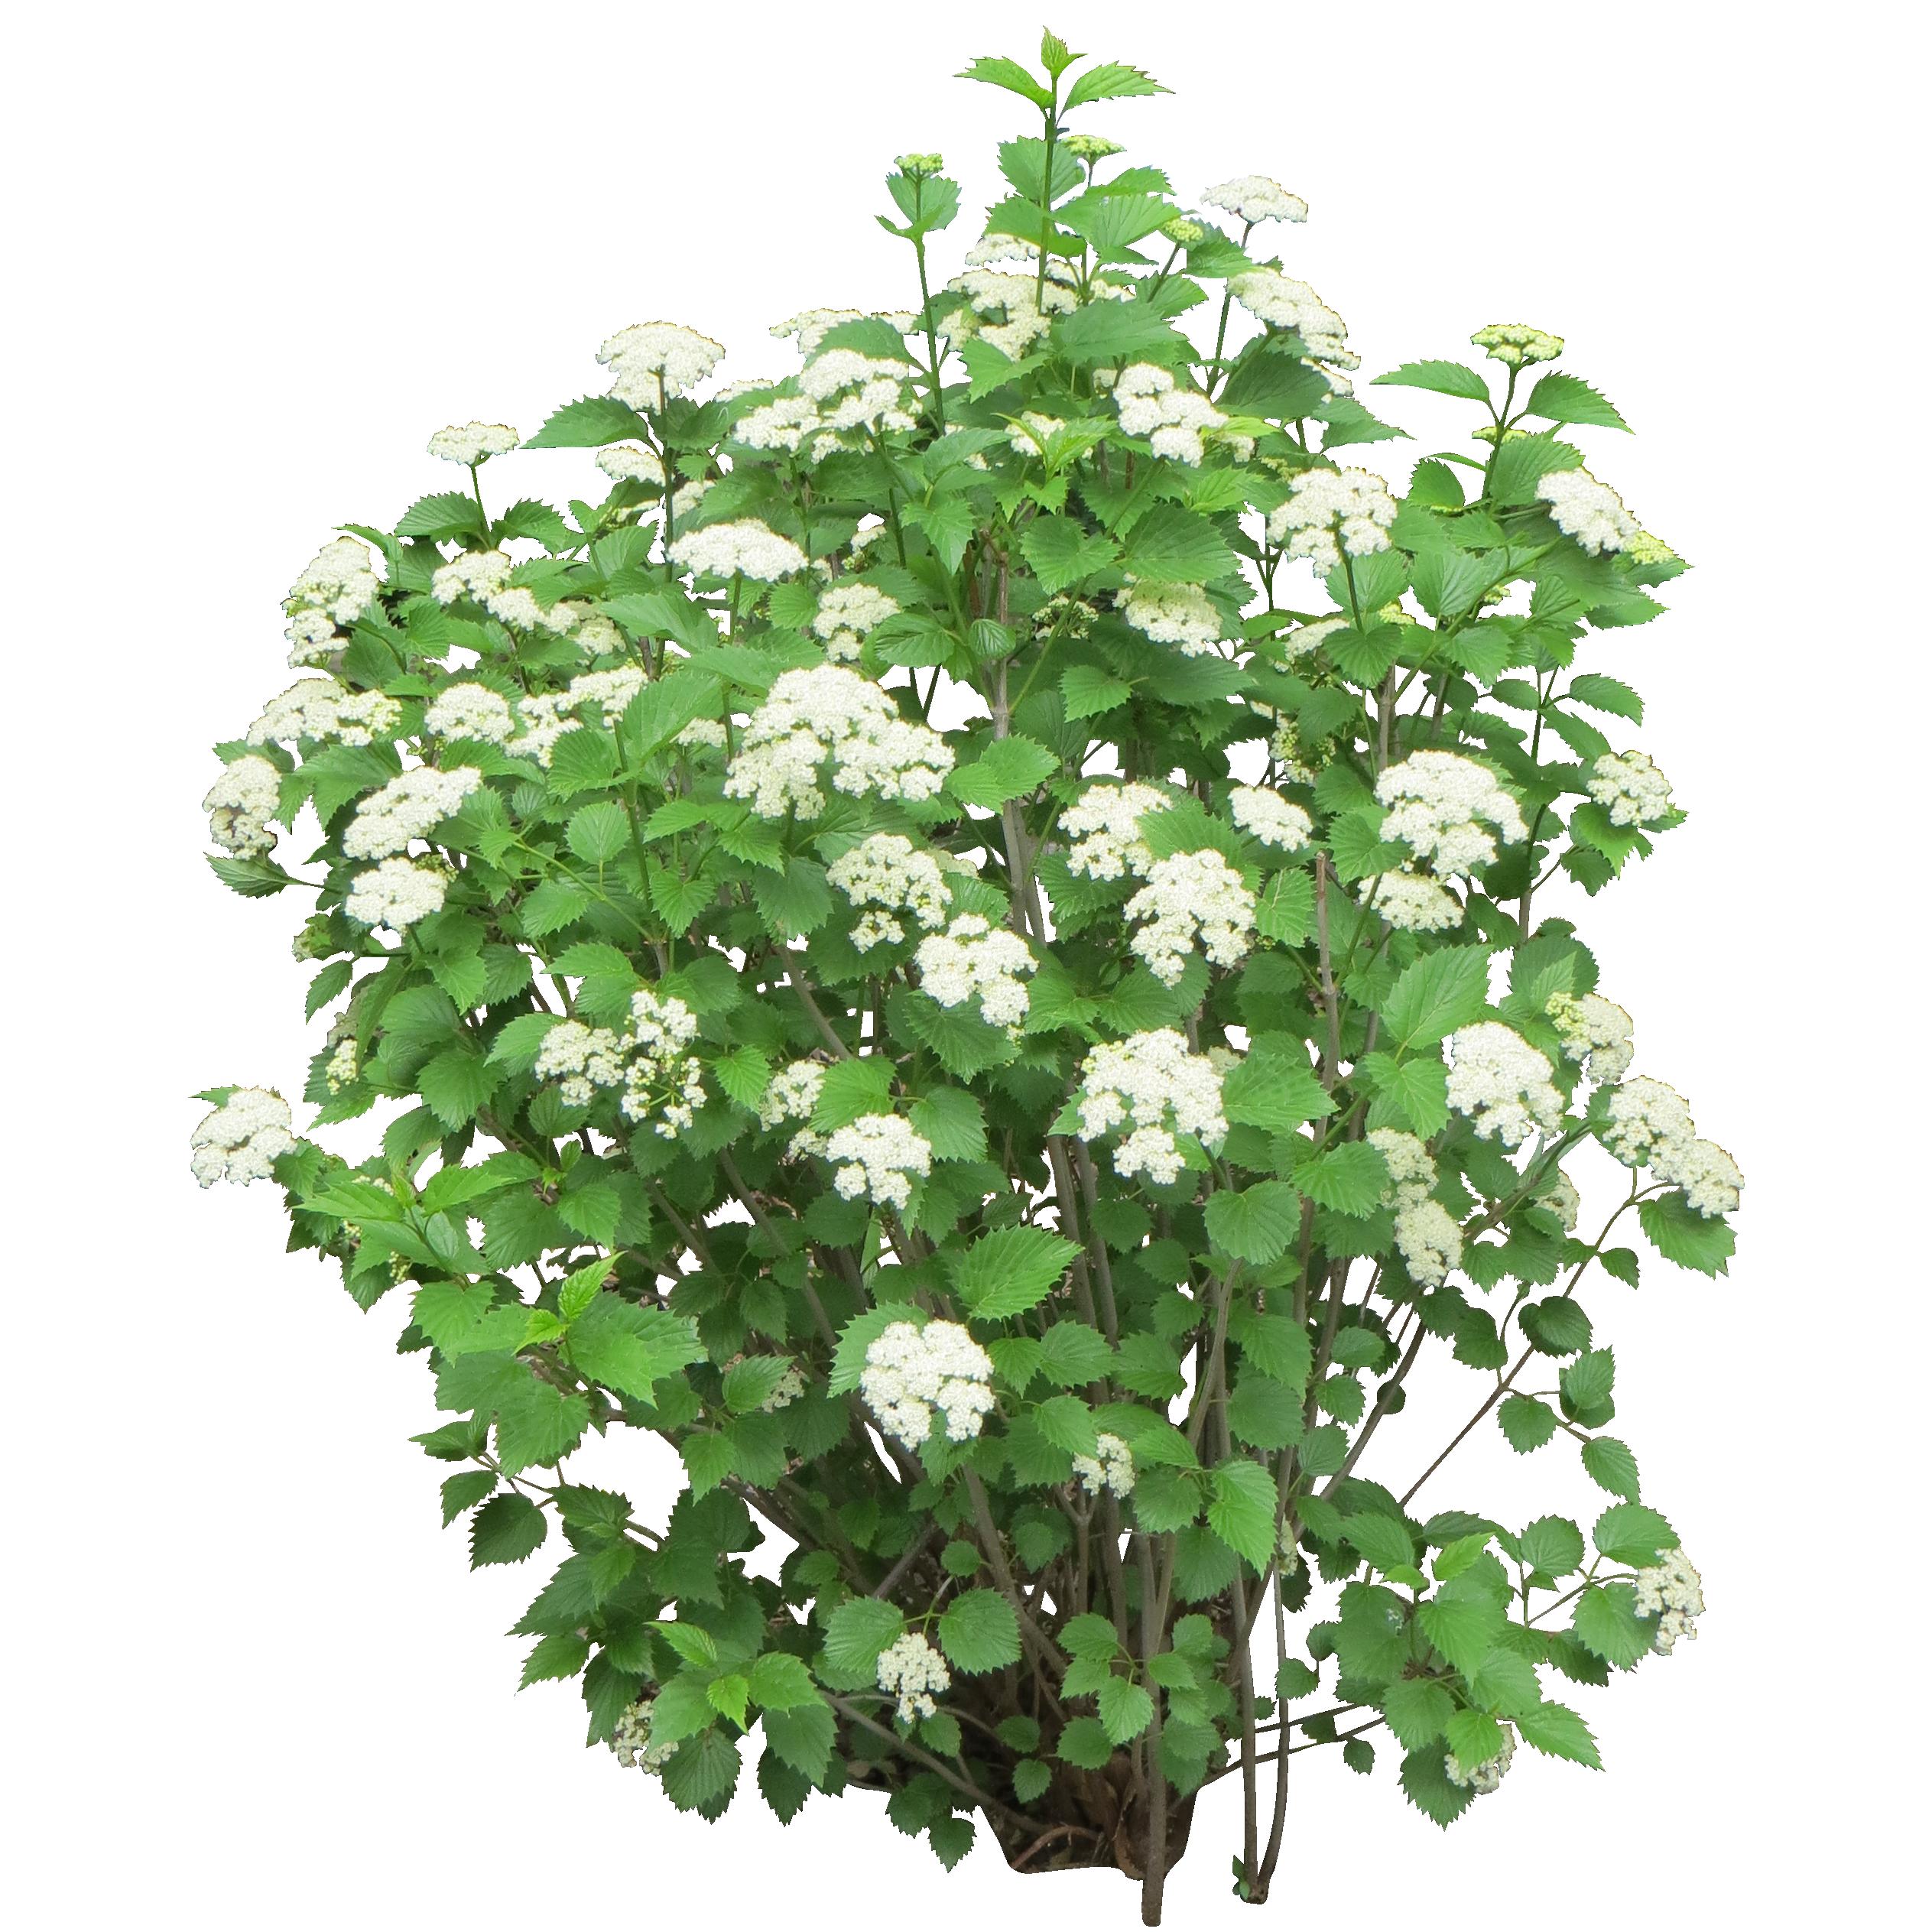 Bushes images free download. Flower plants png